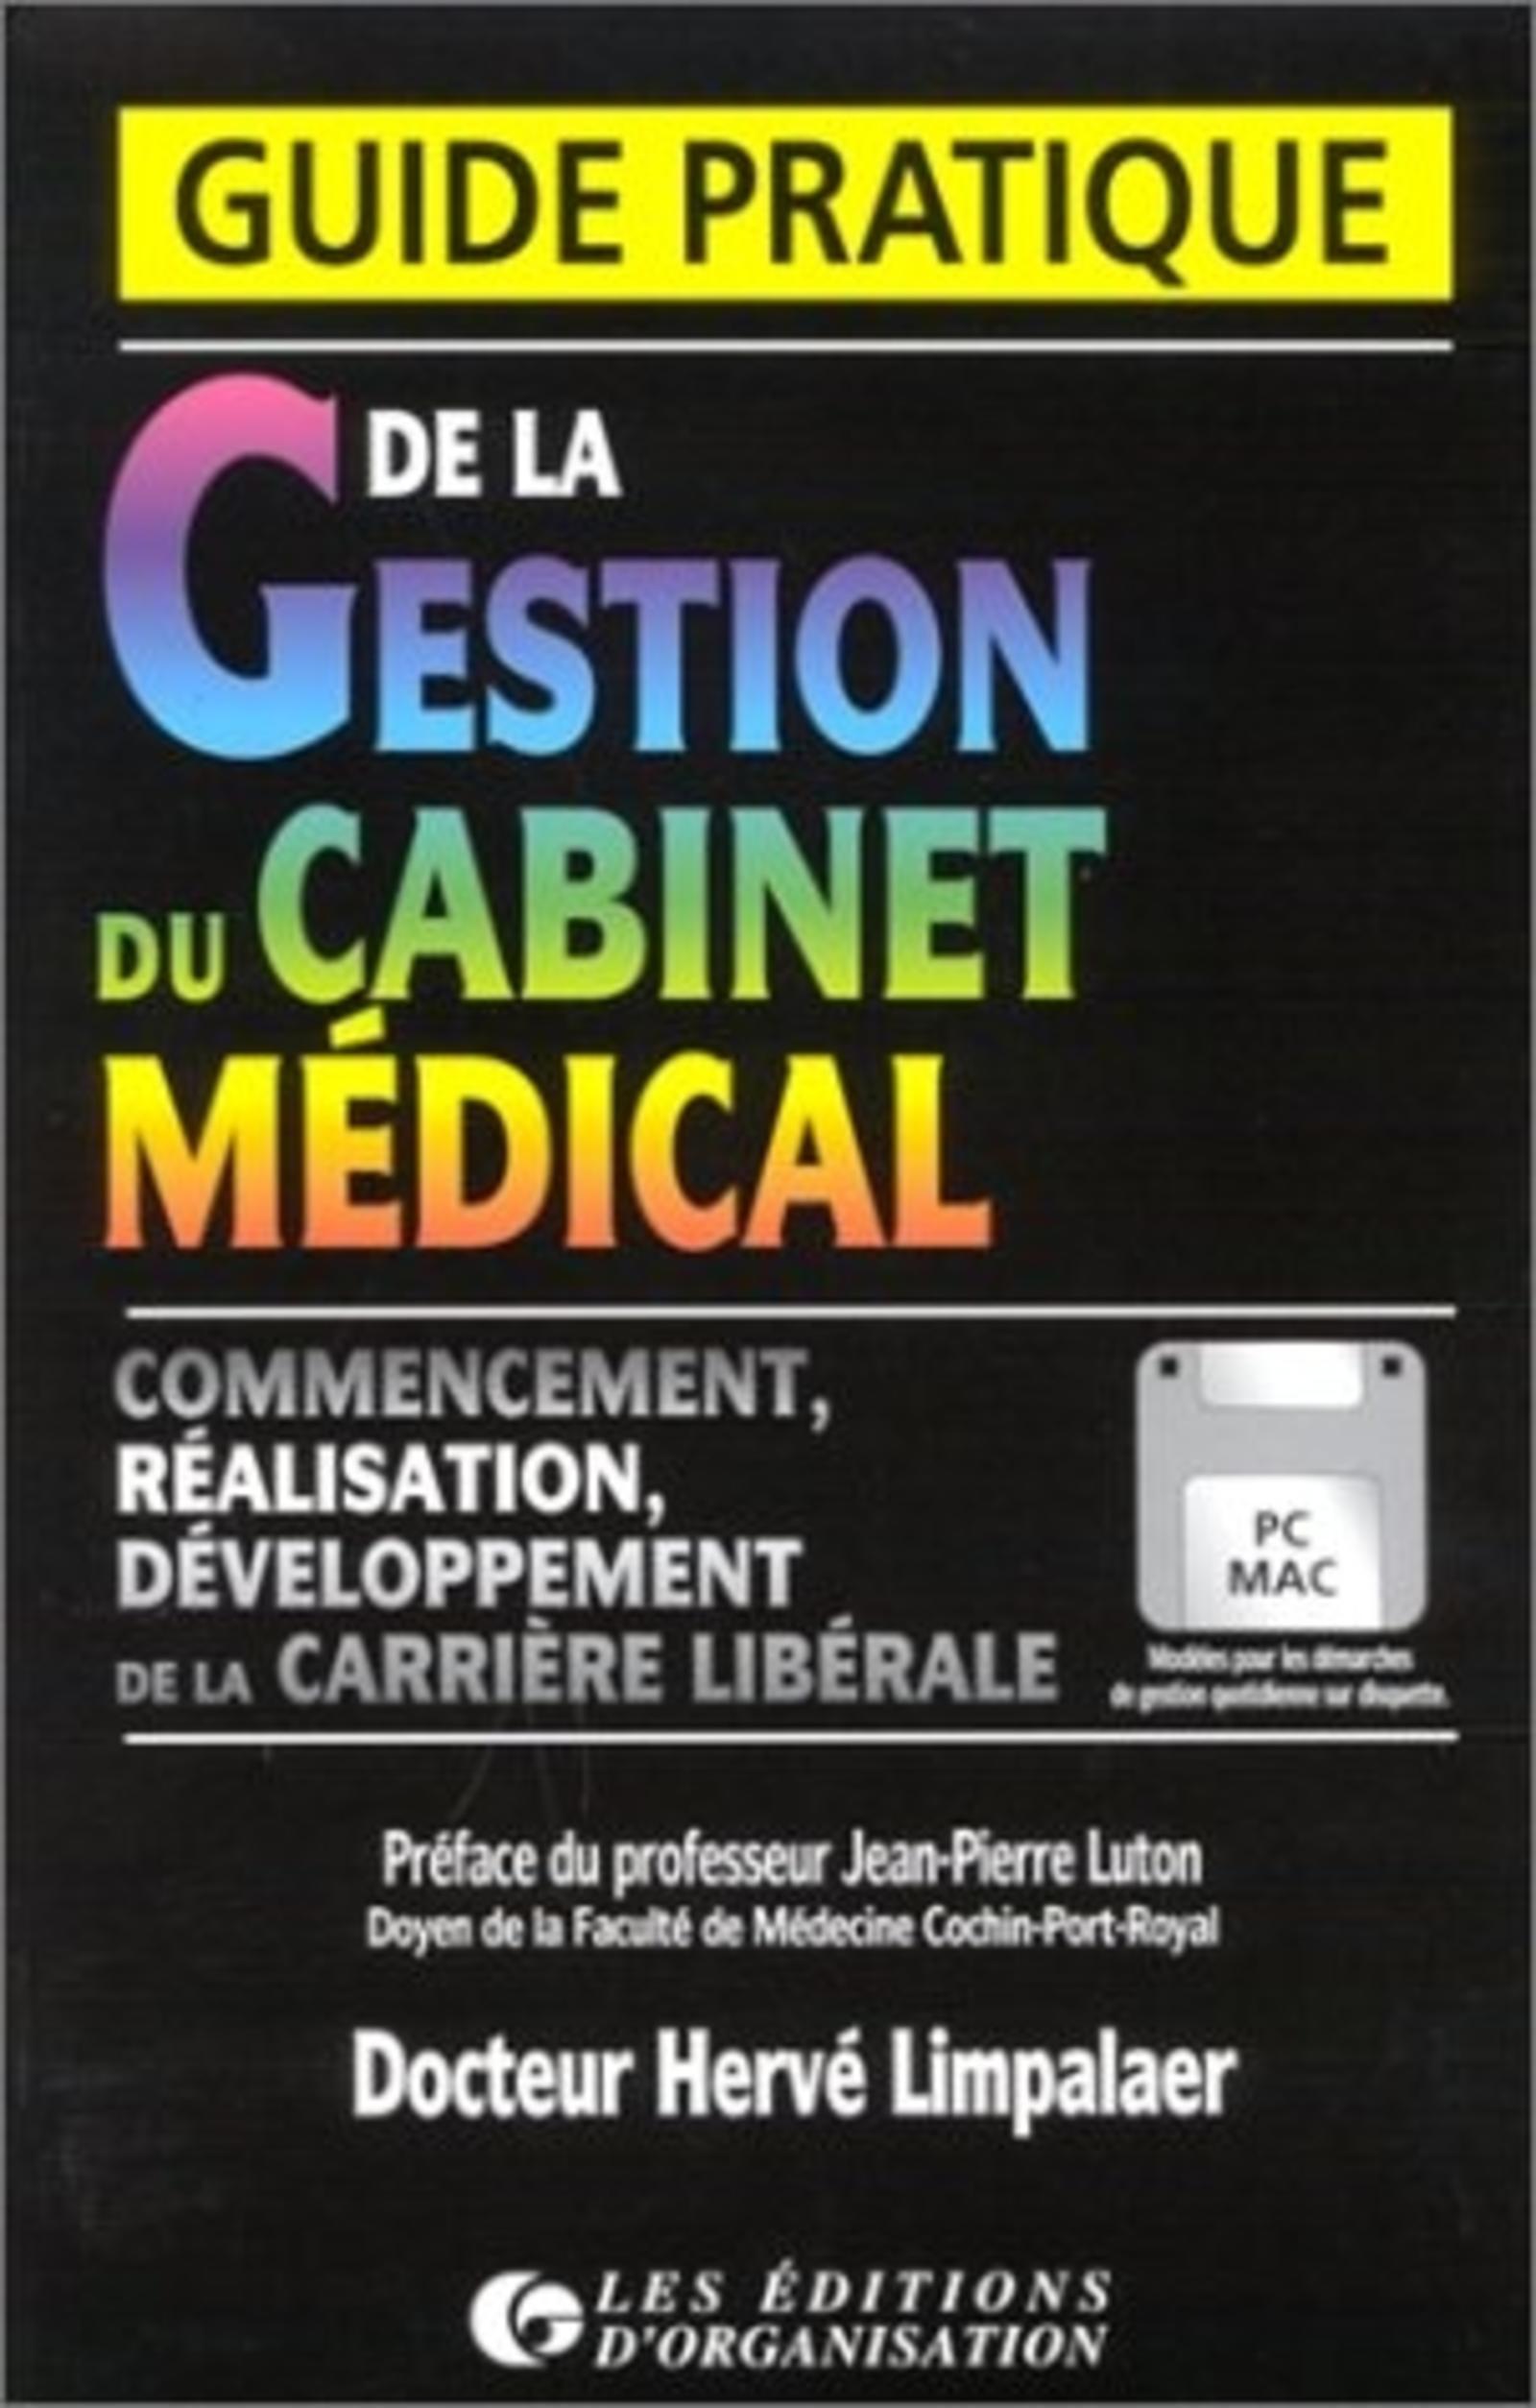 GUIDE PRATIQUE DE GESTION CABINET MEDICAL